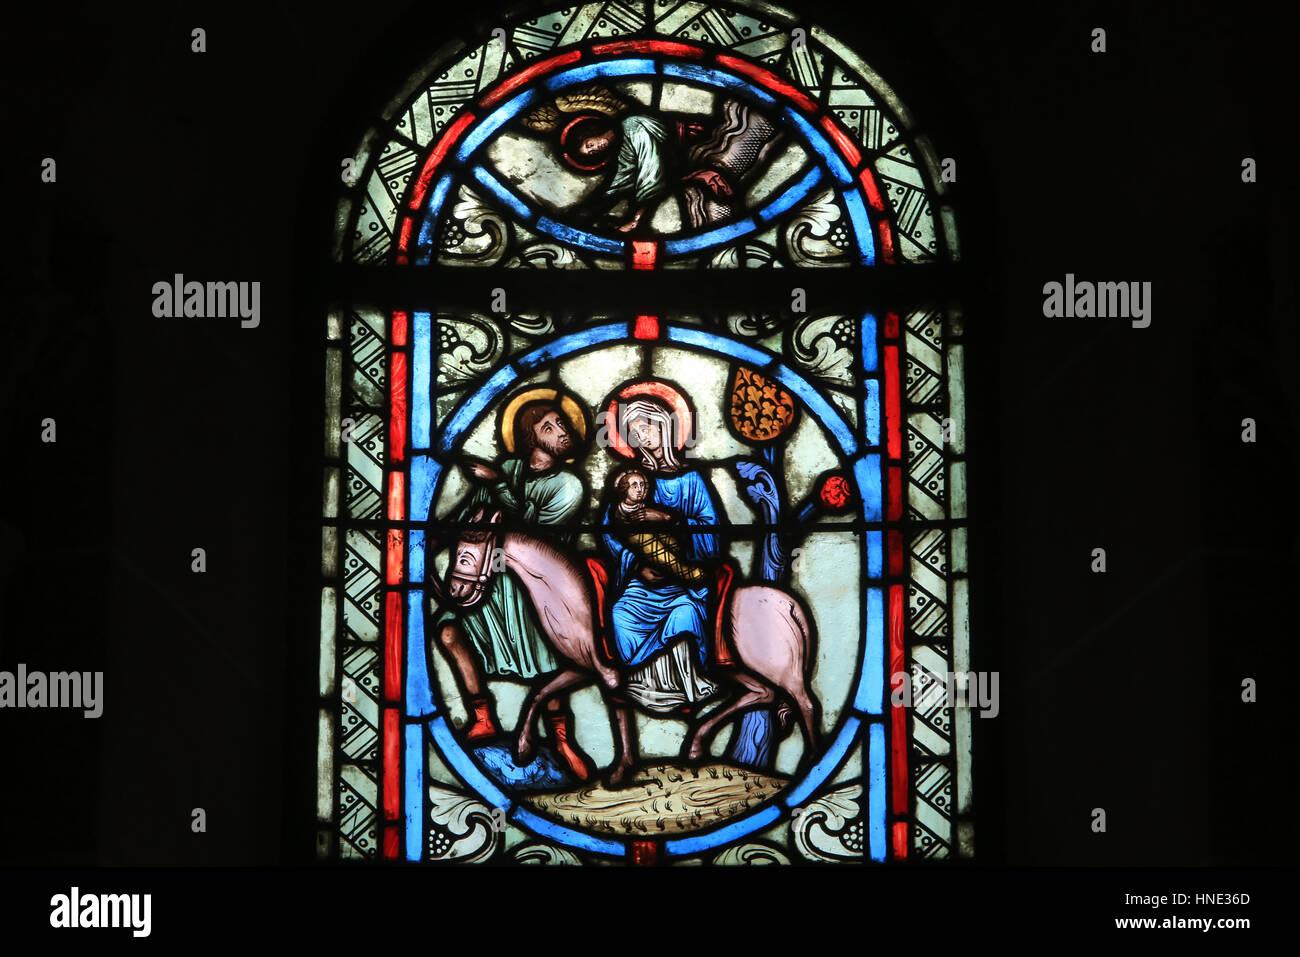 Sacred Heart Basilica. Paray-le-Monial. Stained glass window. La fuite en Egypte. - Stock Image